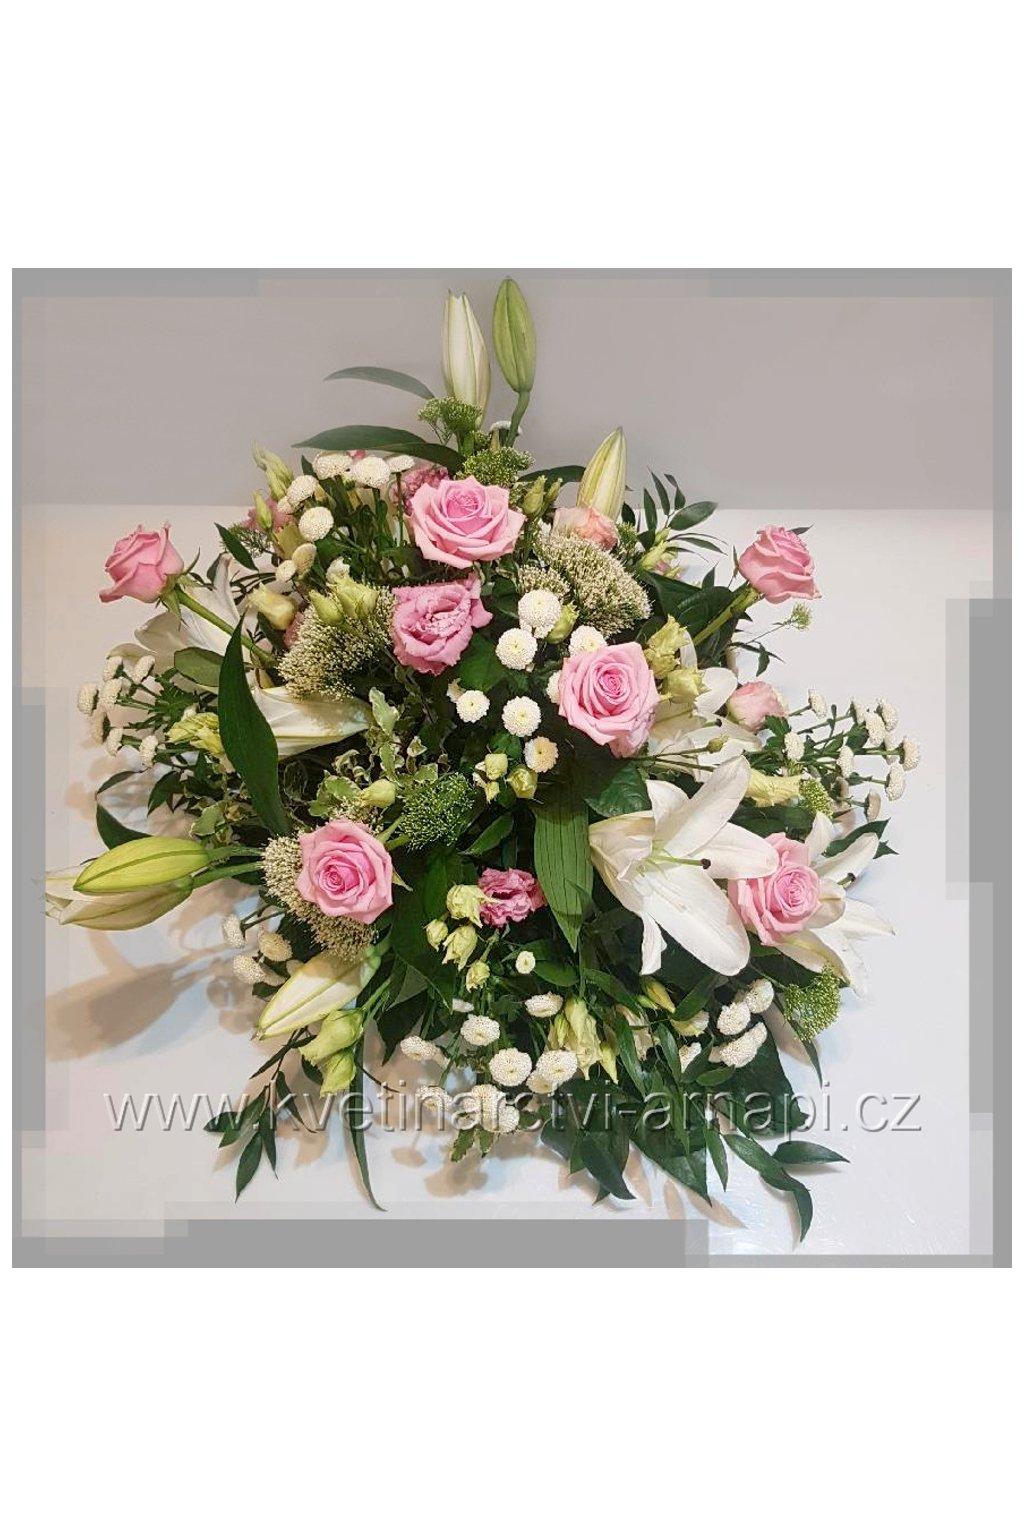 smutecni kytice vypichovana do drzaku eshop kvetinarstvi arnapi